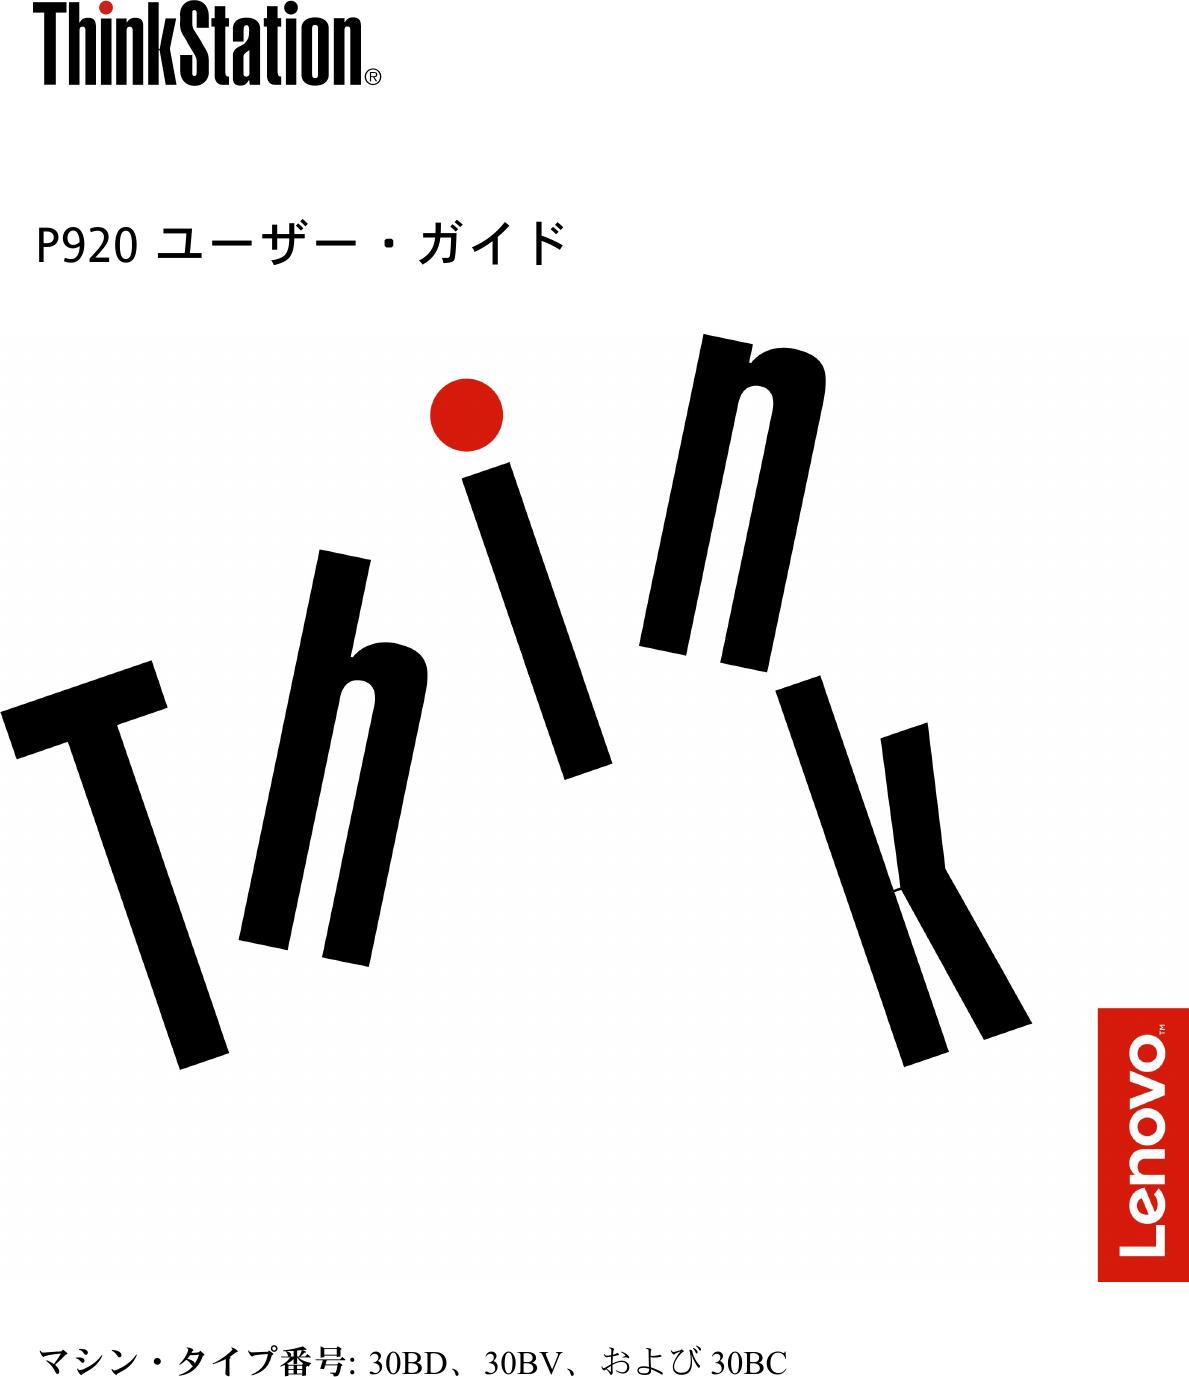 Lenovo P920 Ug Ja User Manual ユーザーガイド (pdf バージョン) Think